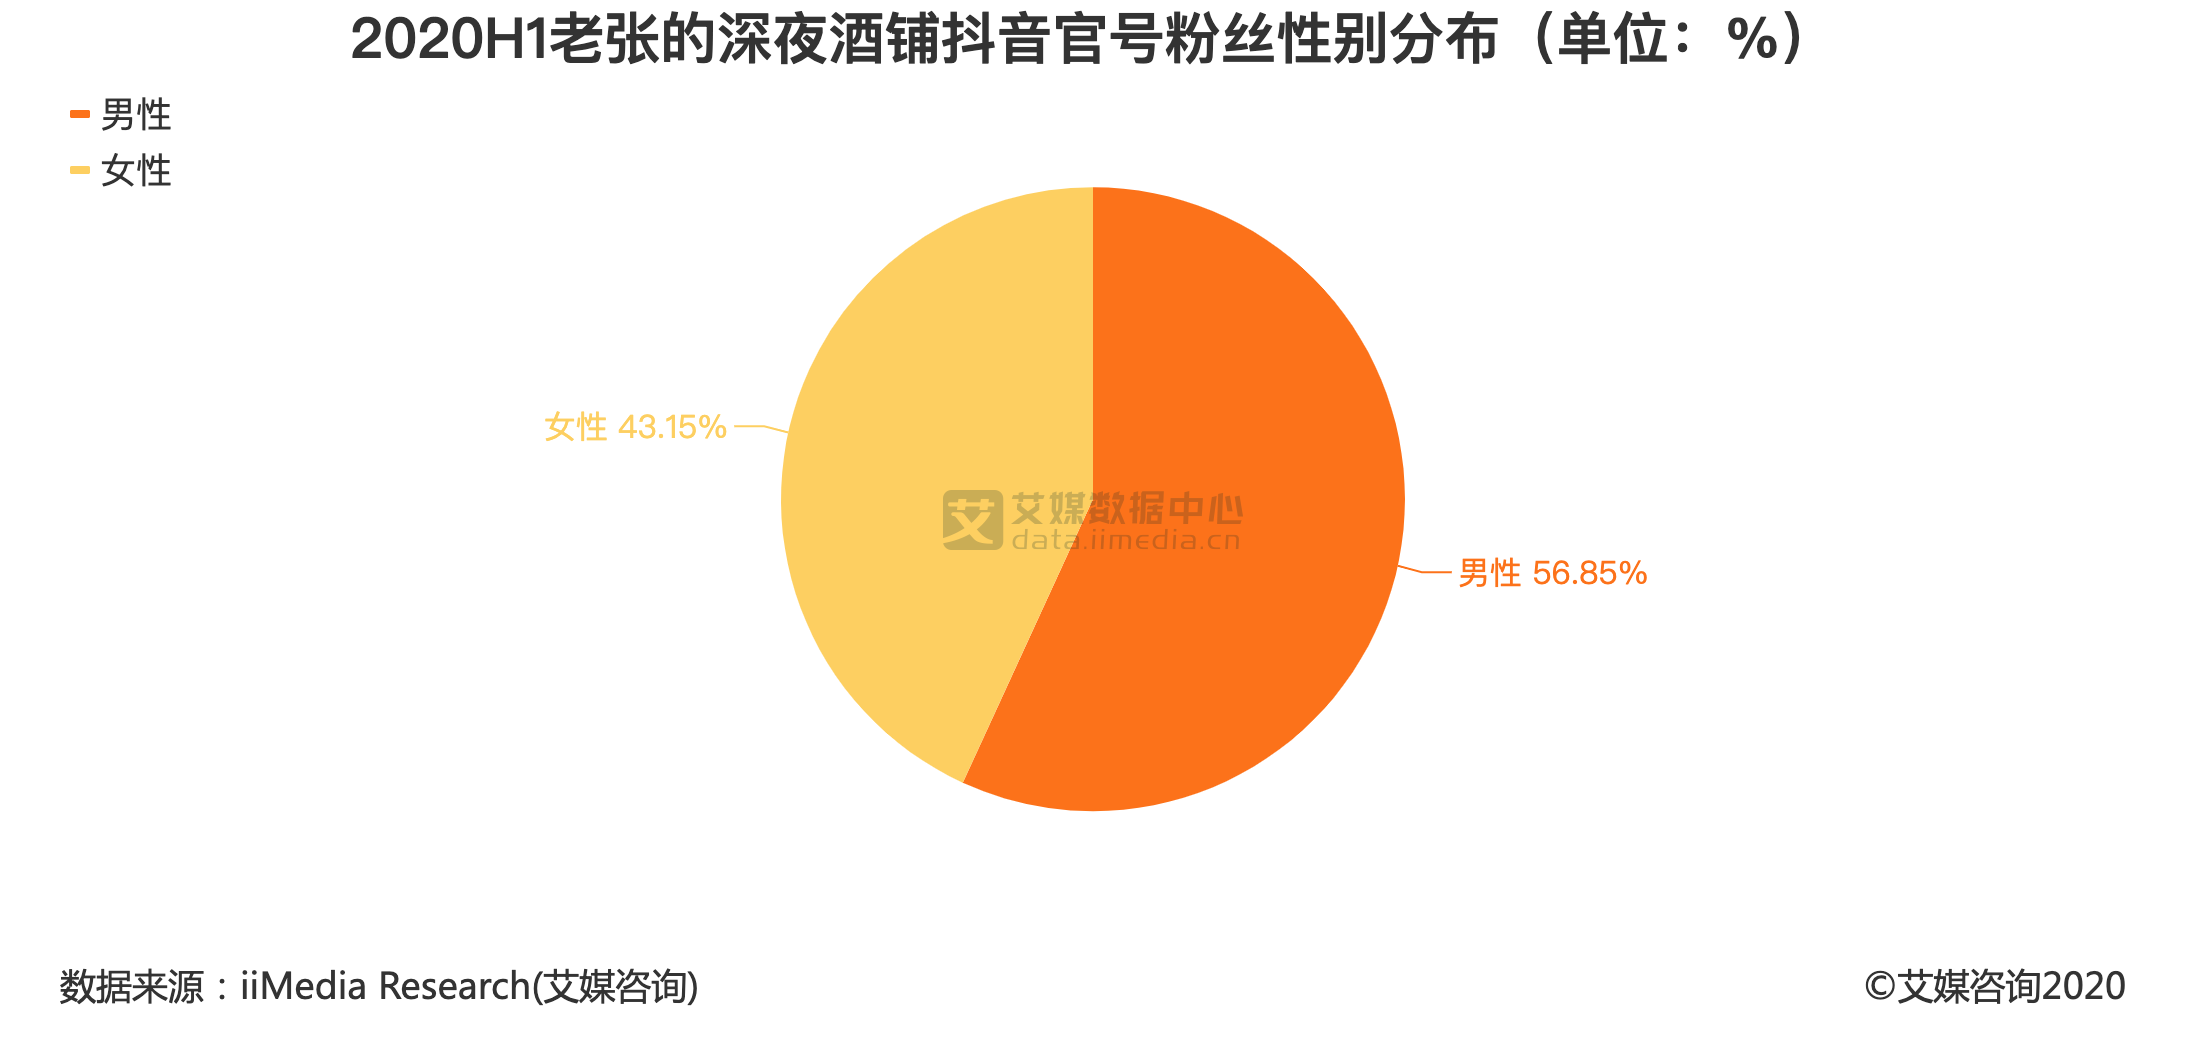 2020H1老张的深夜酒铺抖音官号粉丝性别分布(单位:%)